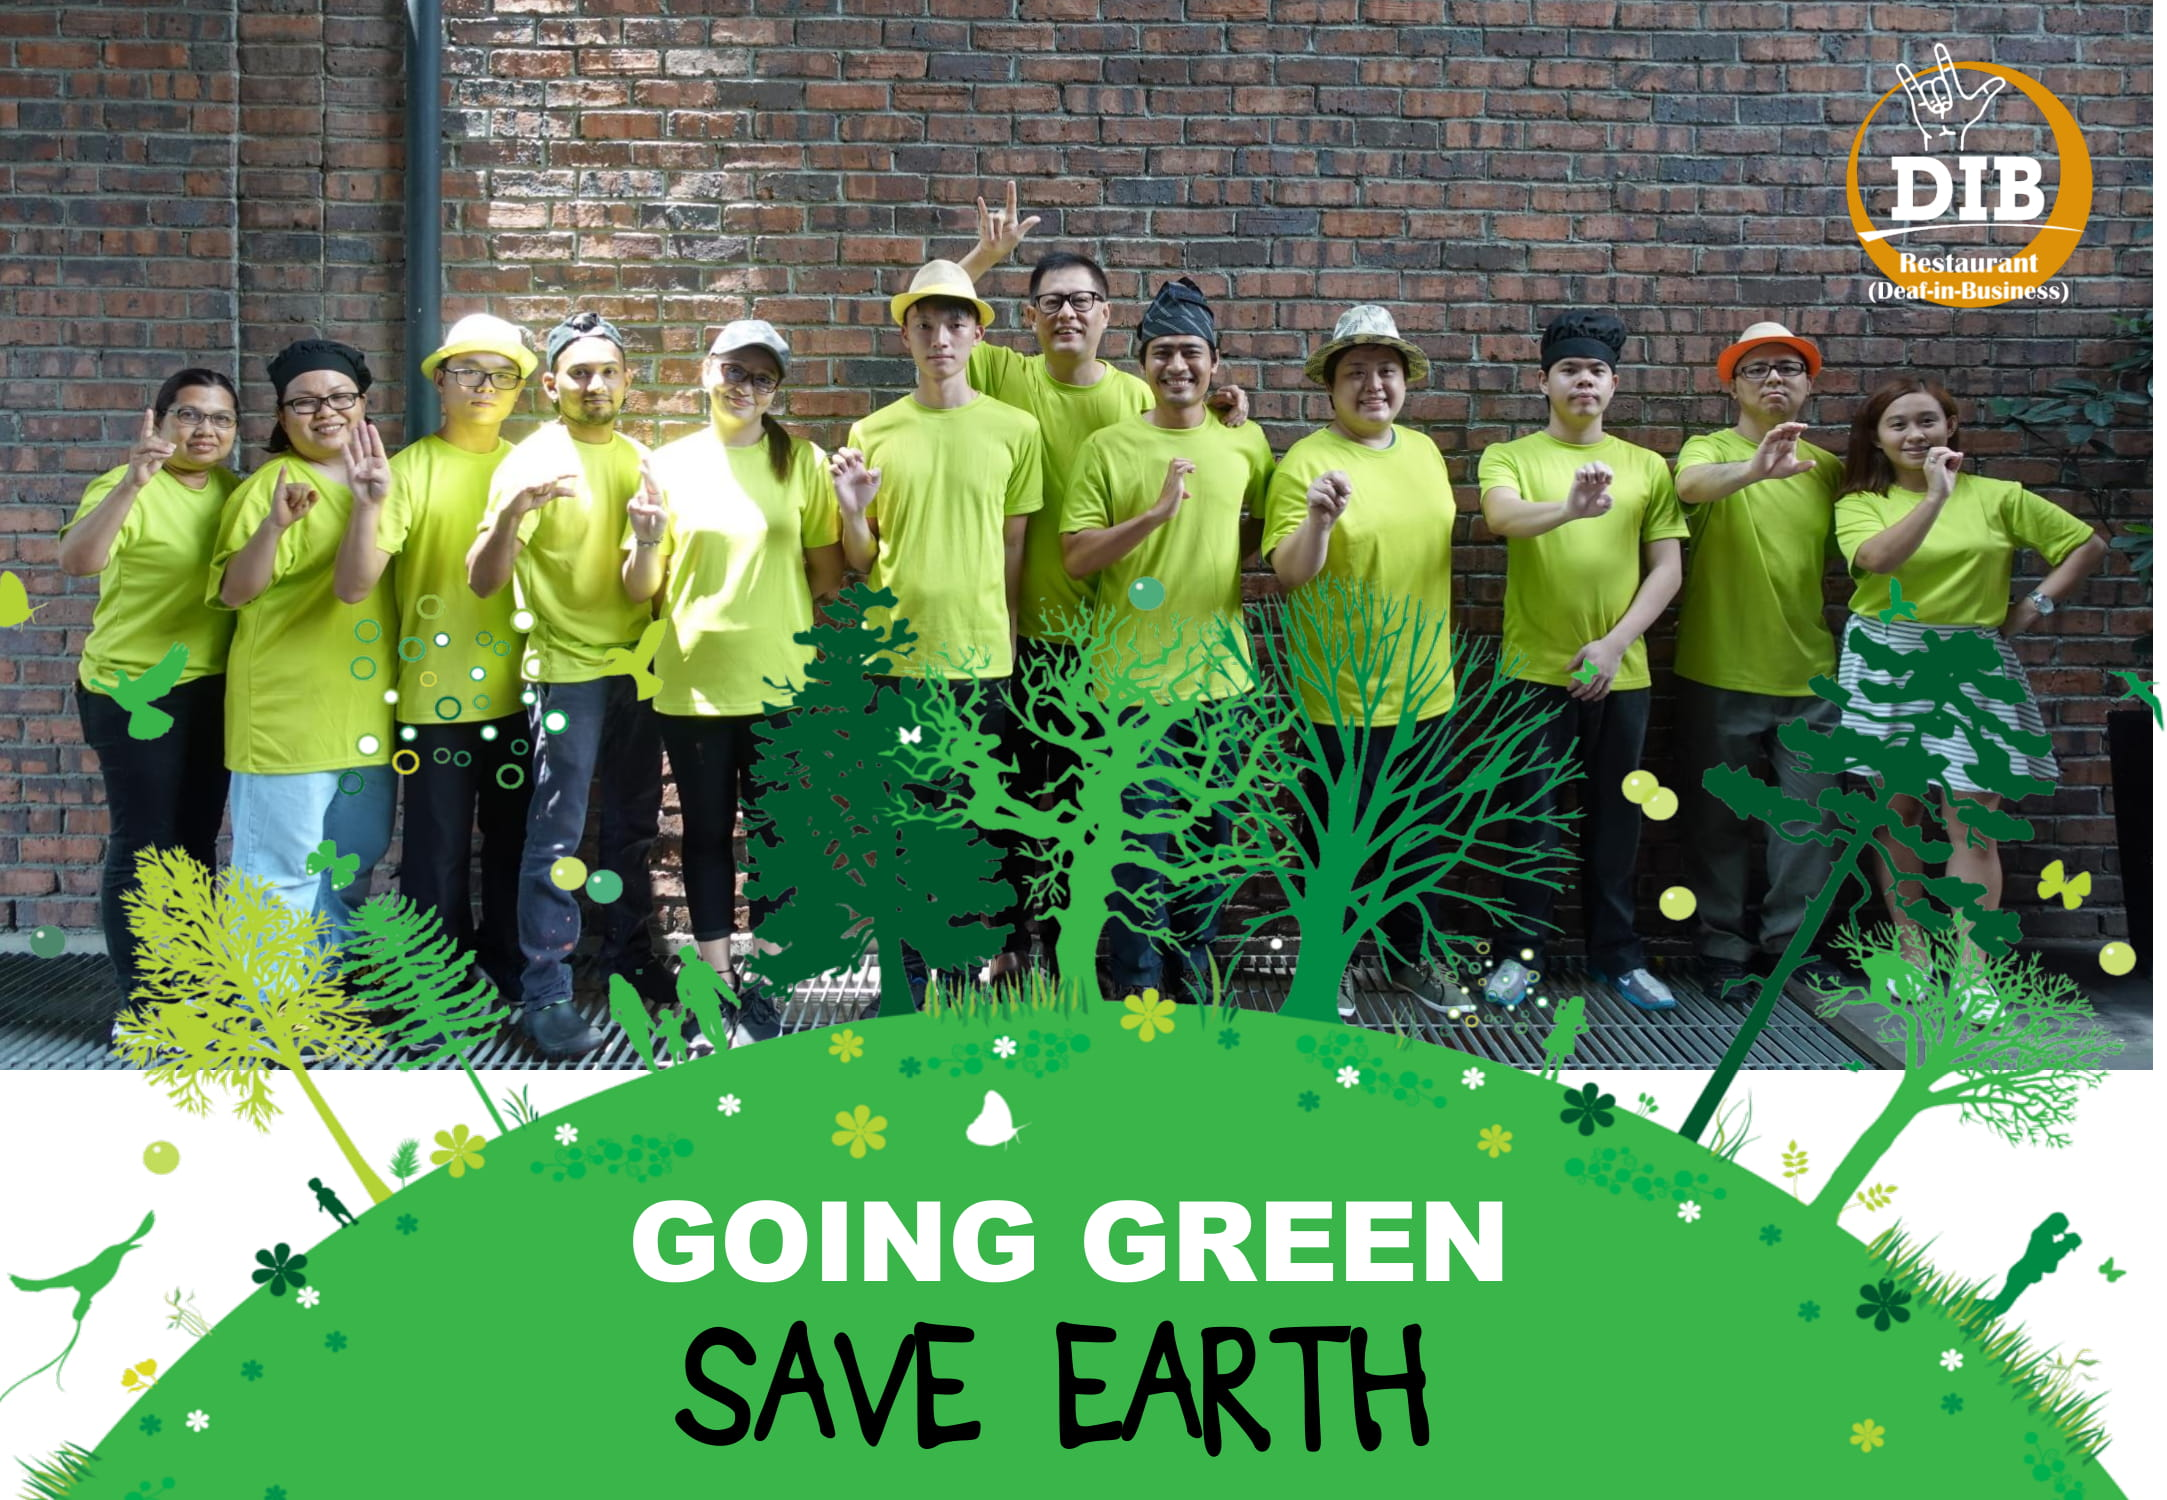 DIB GROUP GOING GREEN (2019) JPEG